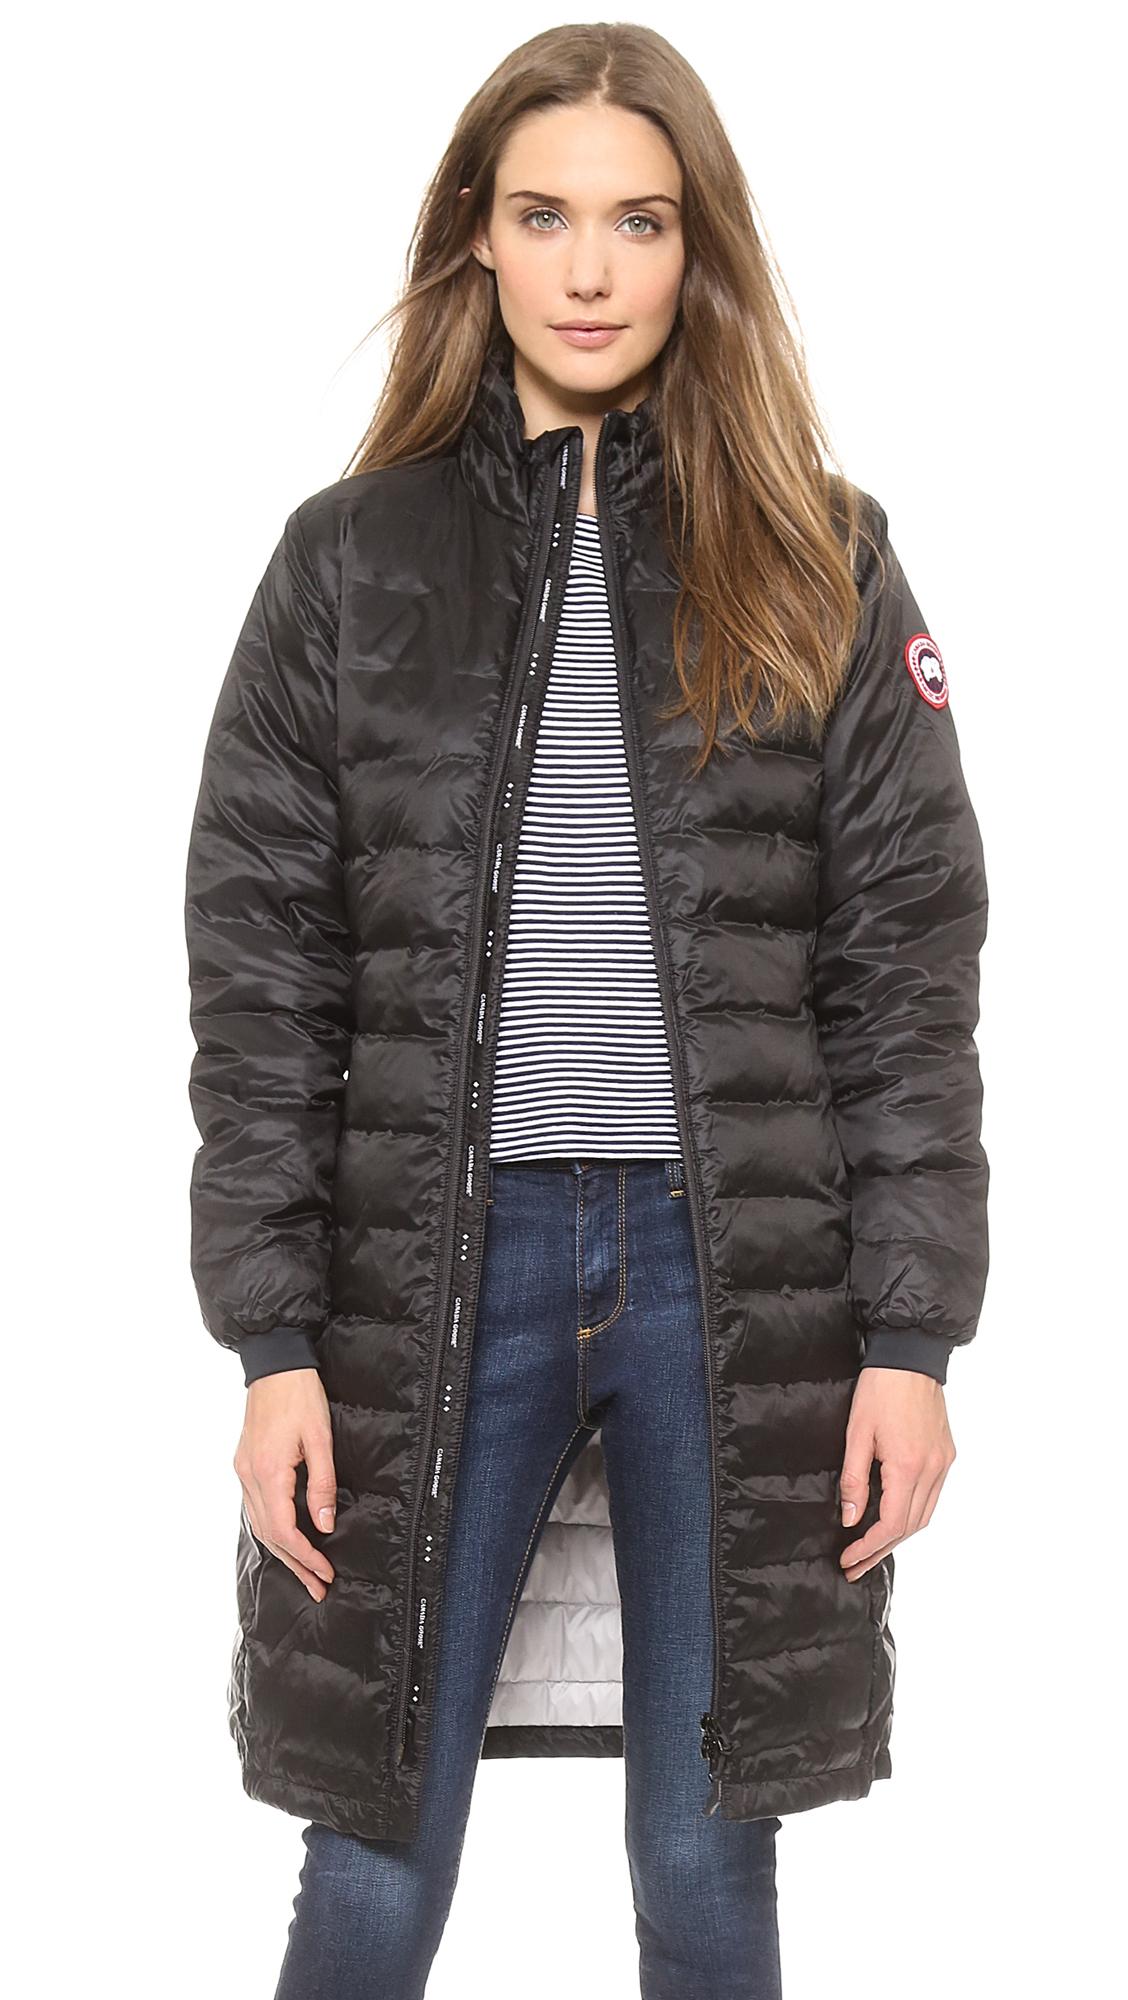 canada goose camp hooded jacket black women's